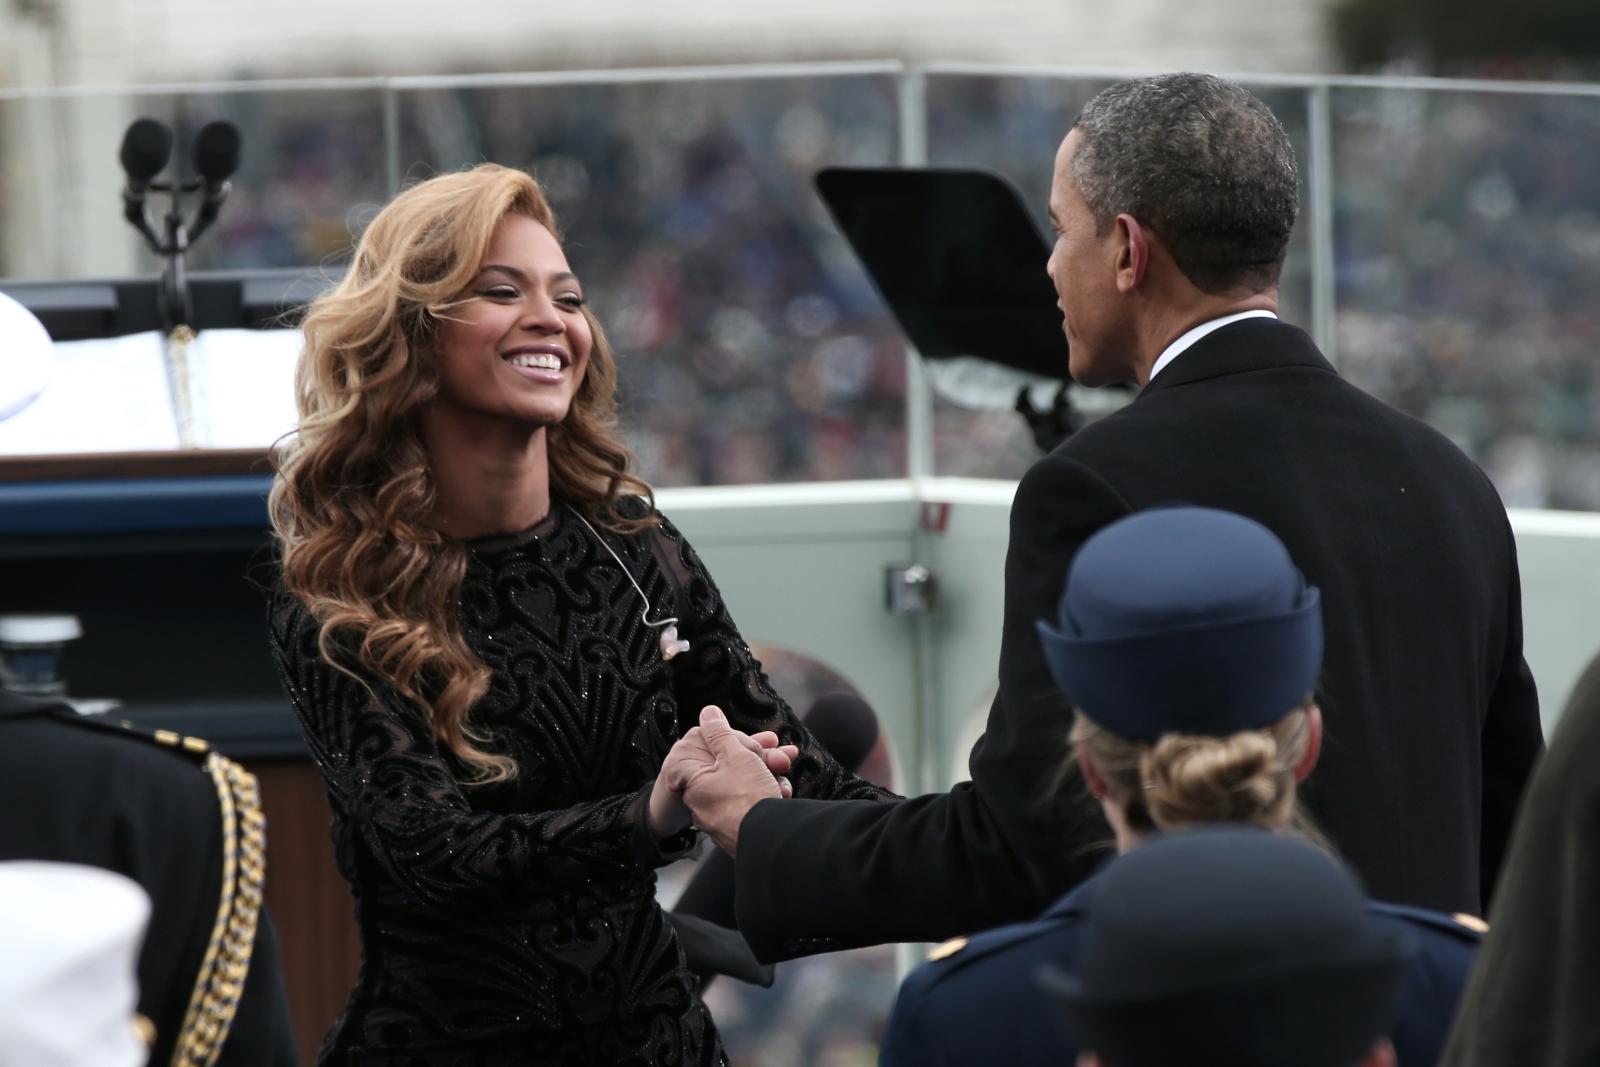 Beyoncé Knowles and Barack Obama